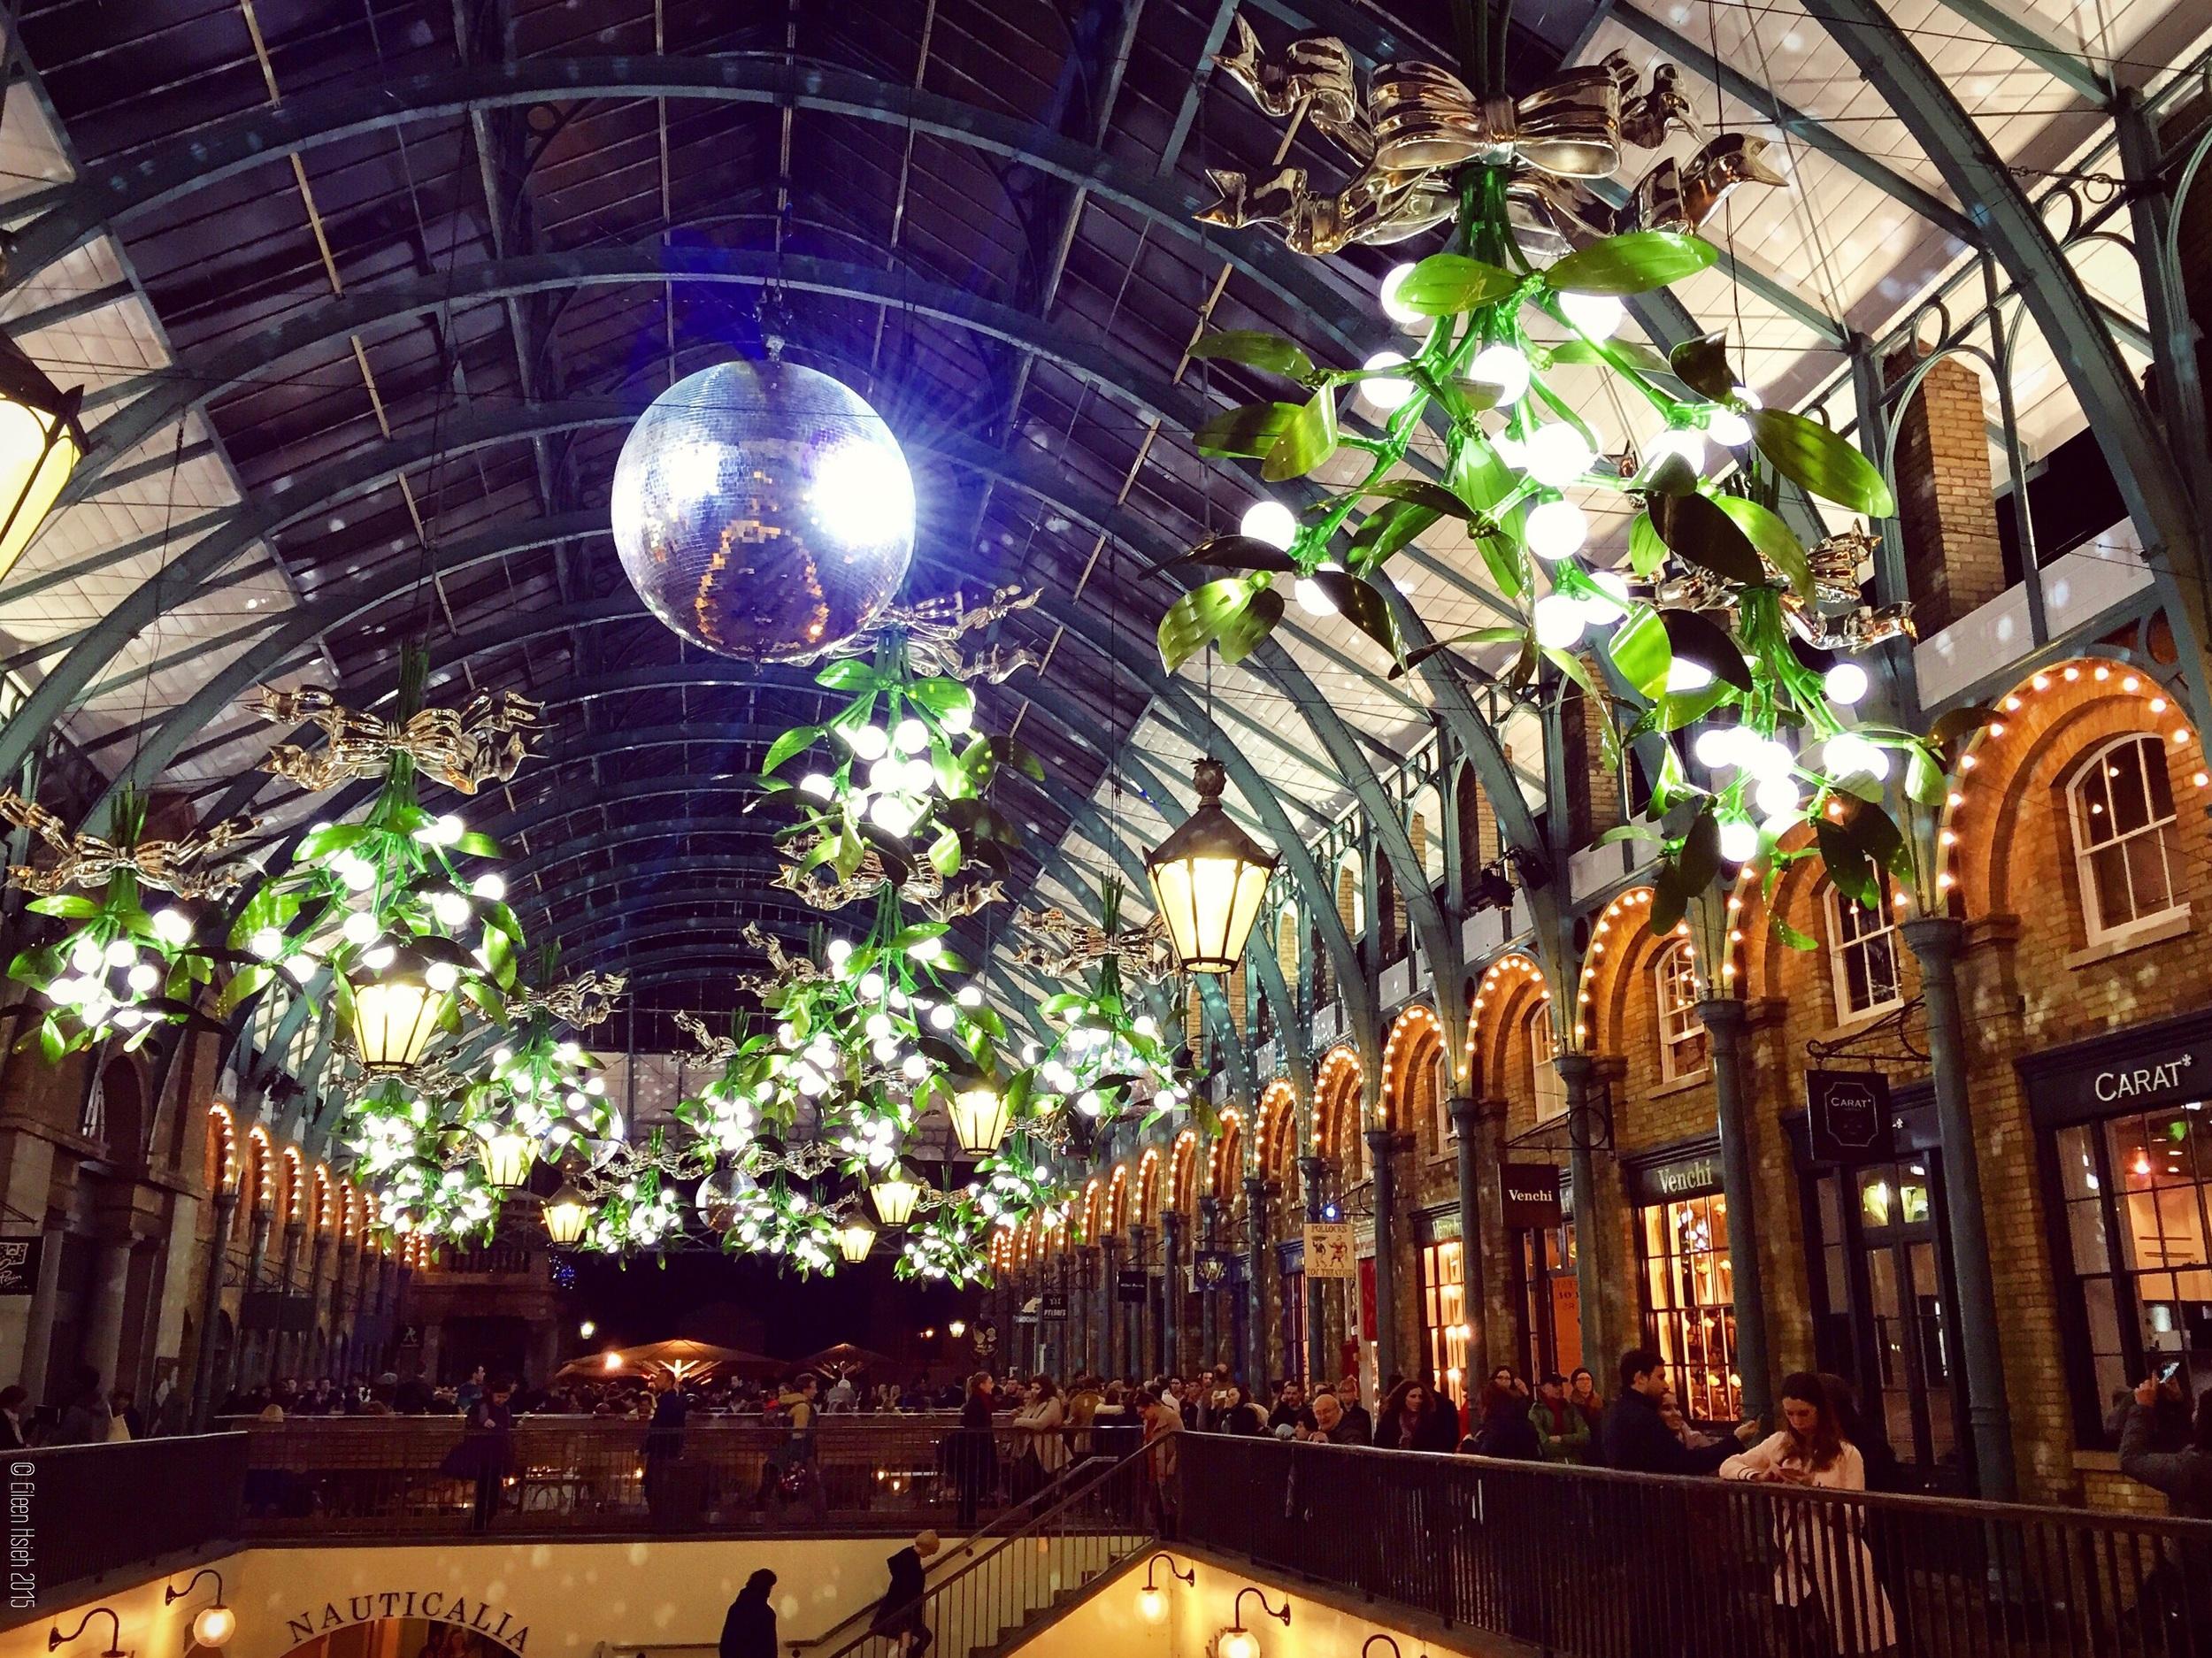 Covent Garden 今年聖誕走的是自然風,呈現青綠色的新彩燈,和它的蘋果市場相呼應。